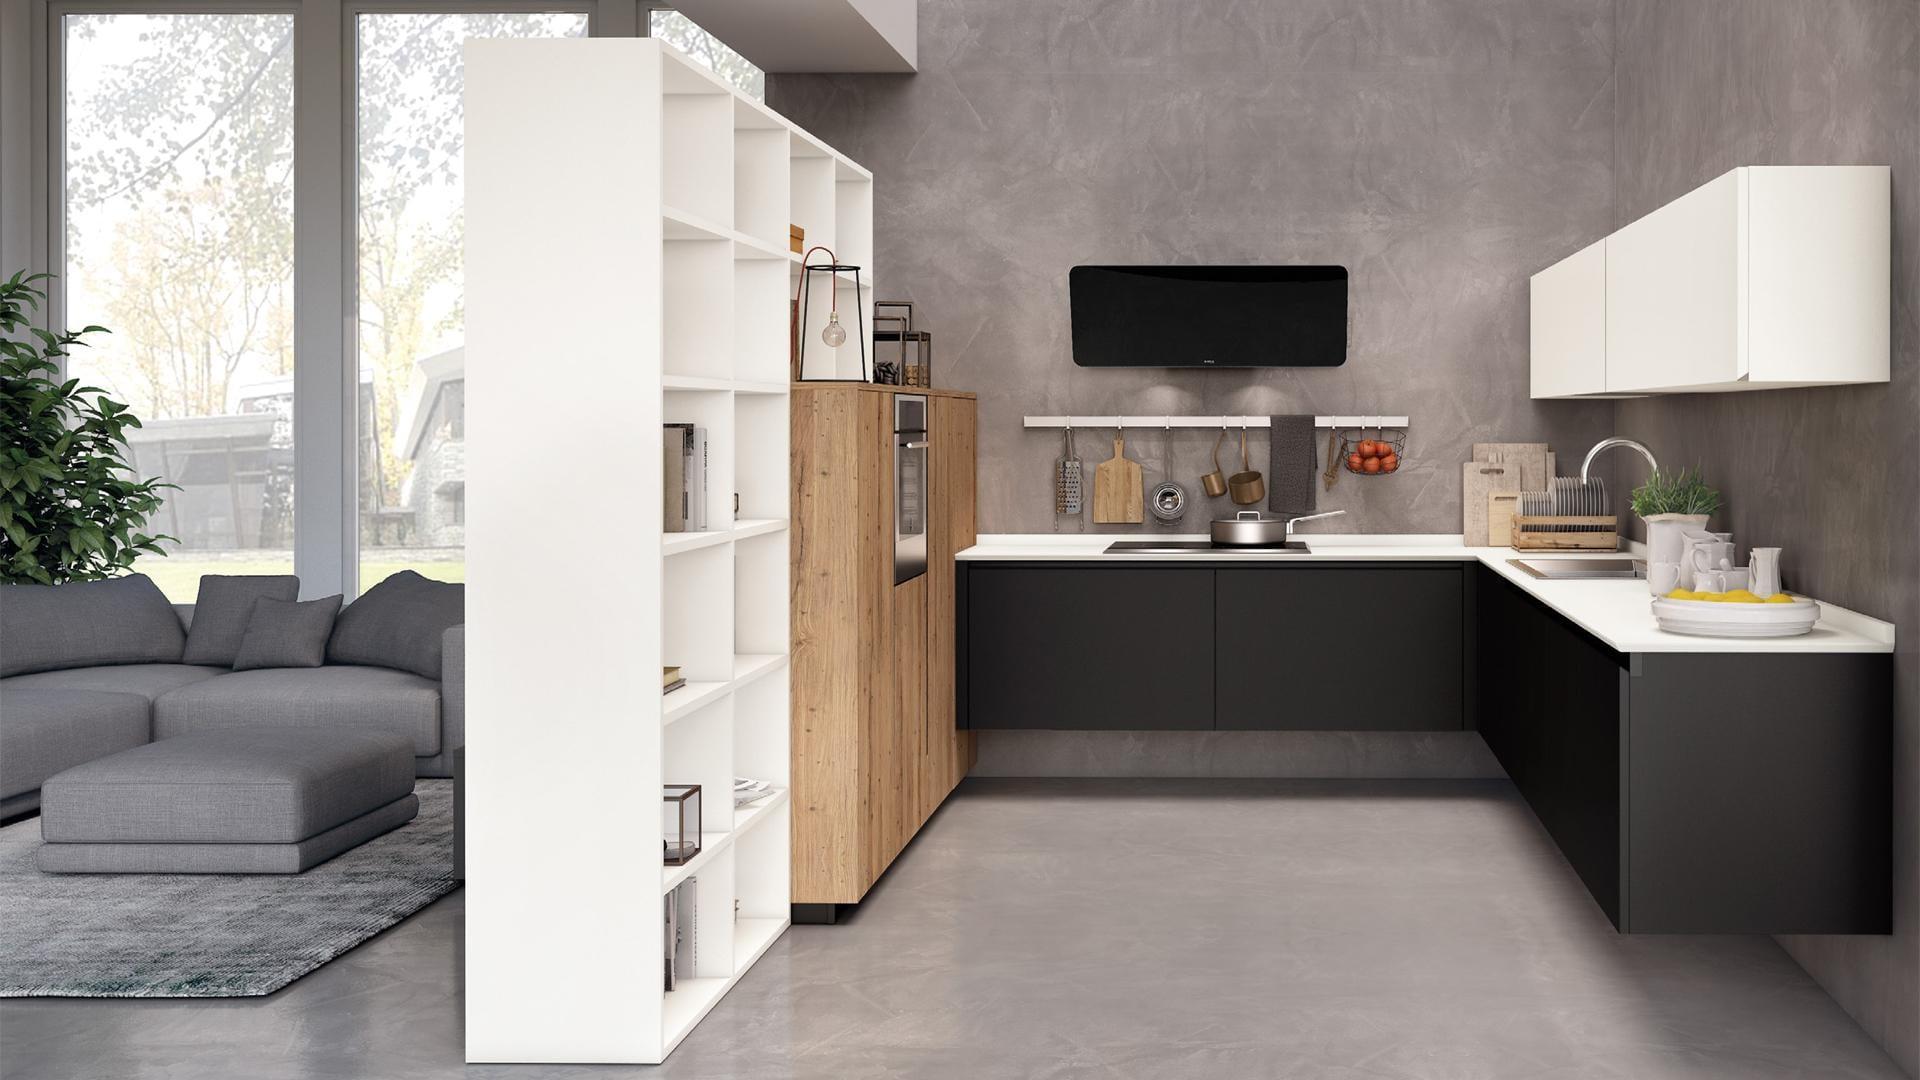 Cucina Lube Raimondi Idee Casa